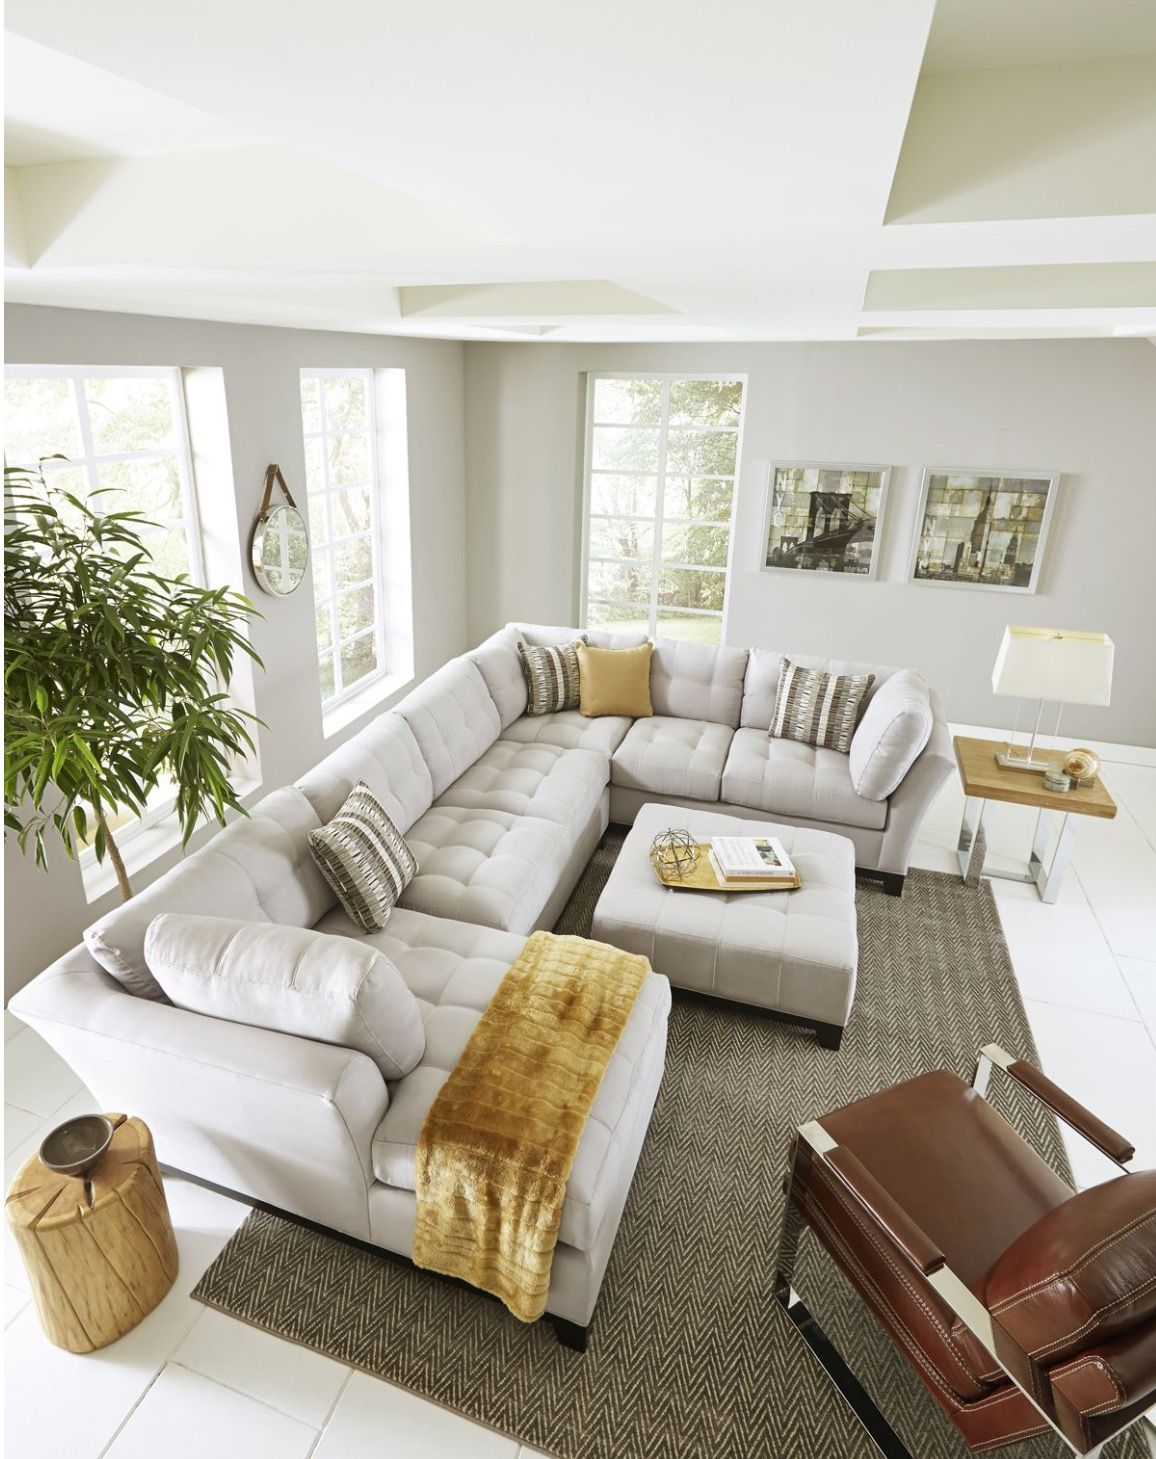 Pin De Arlene Moore En For The Home Pinterest Decoracion De  # Muebles Sala De Estar